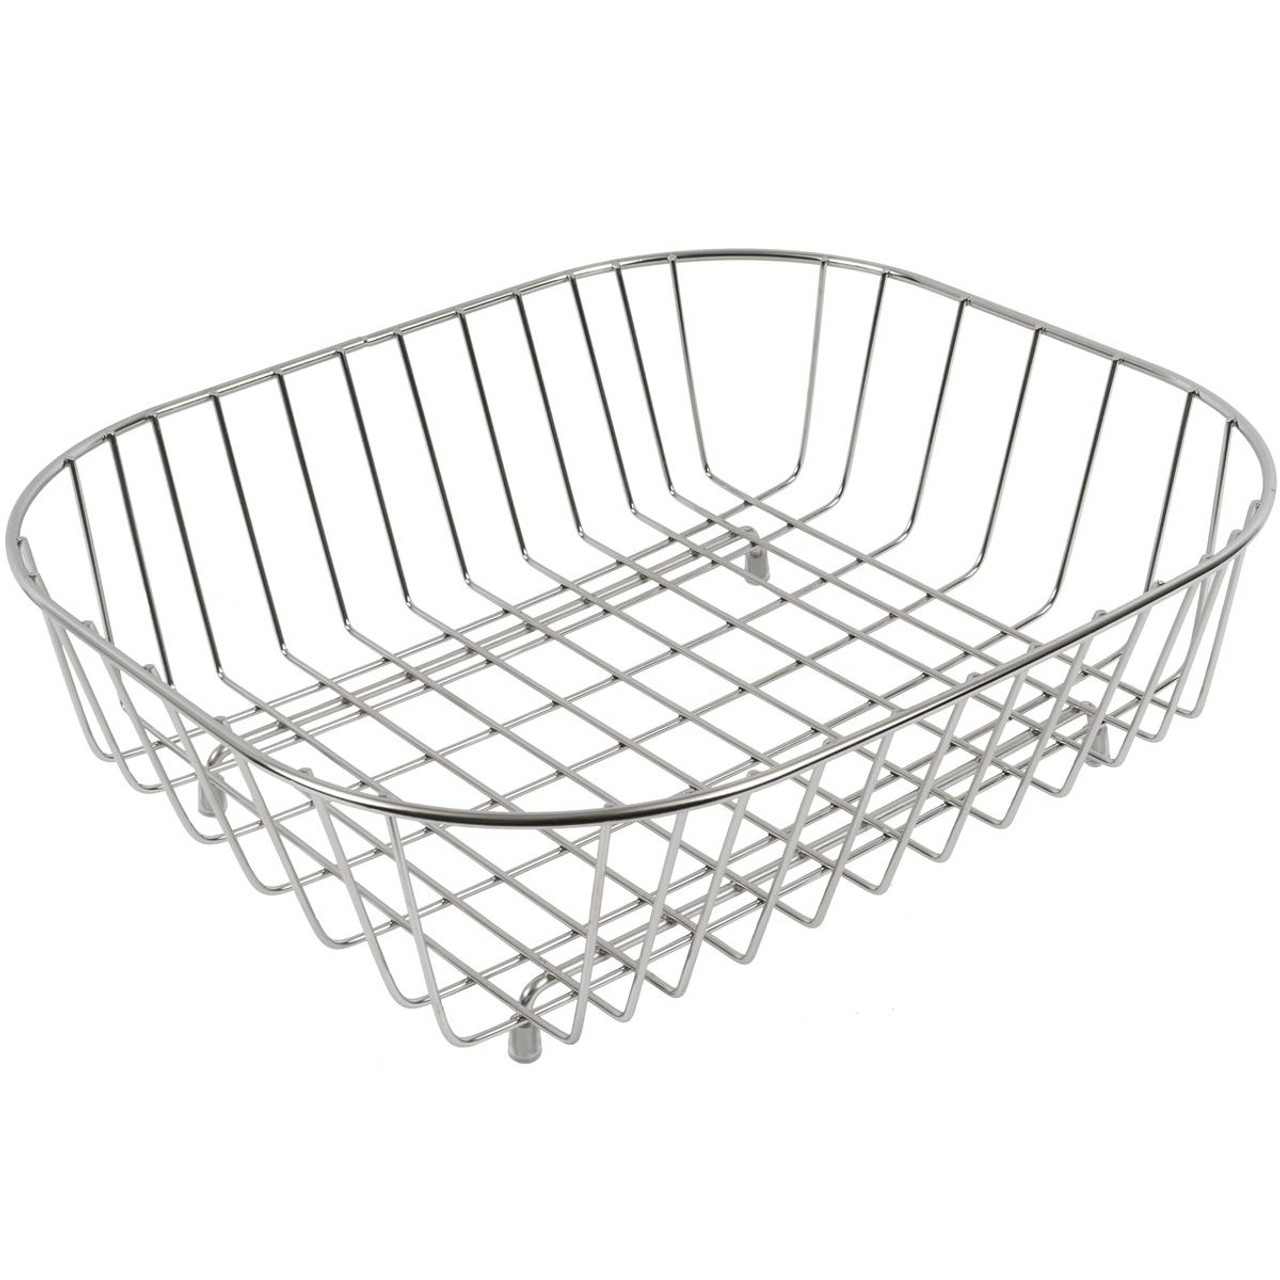 Delfinware Stainless Steel Oval Sink Basket